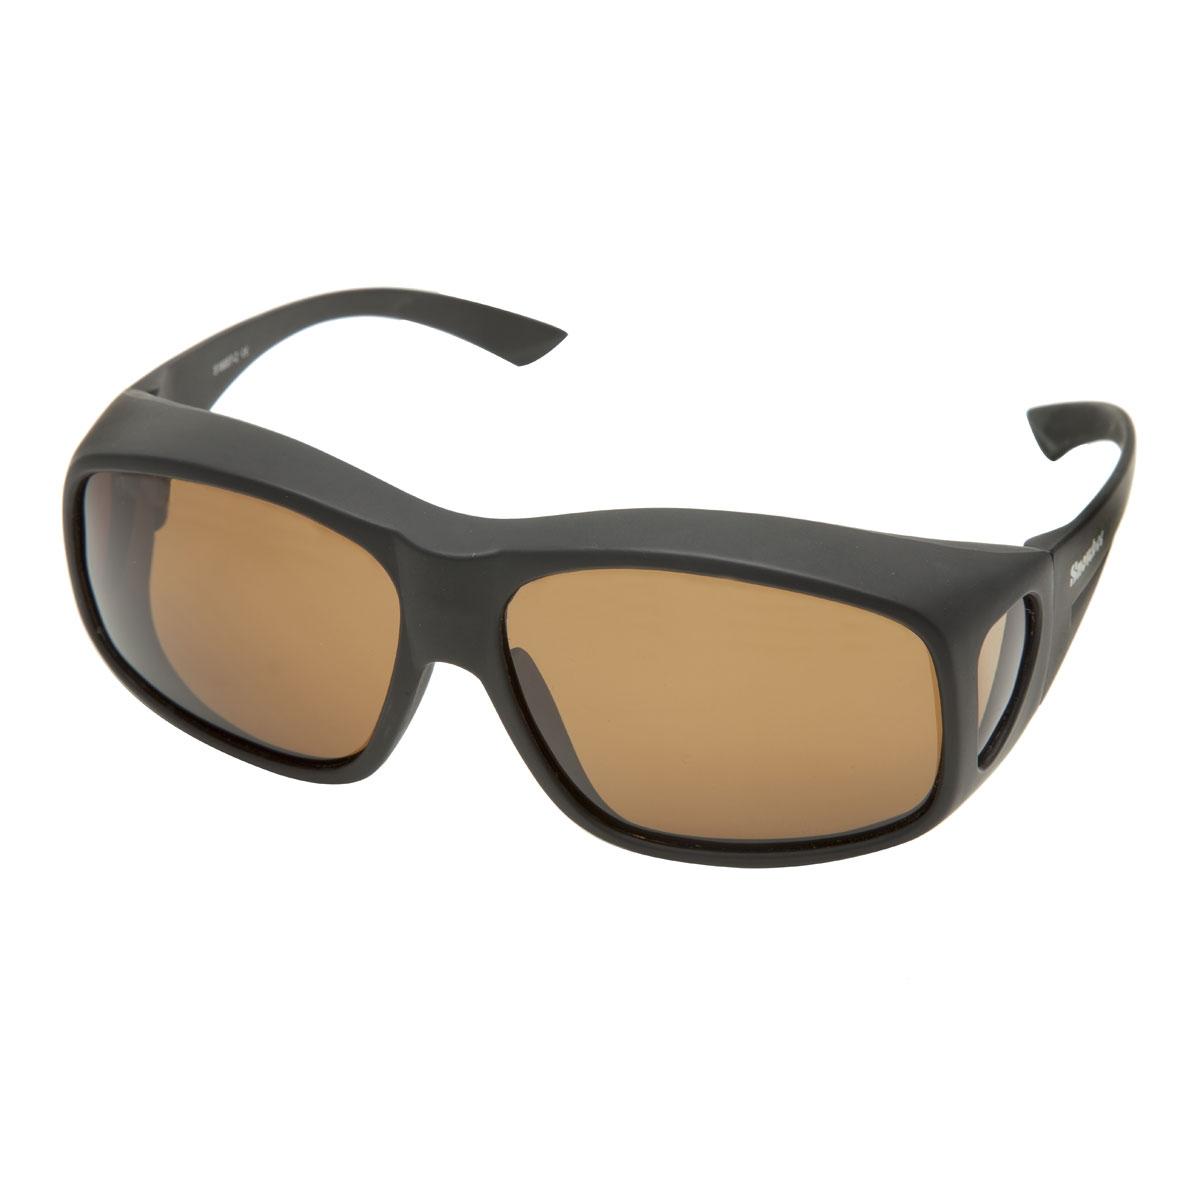 9480f4dda5 Image of Snowbee Prestige Over-Specs Sunglasses - Matte Black   Amber